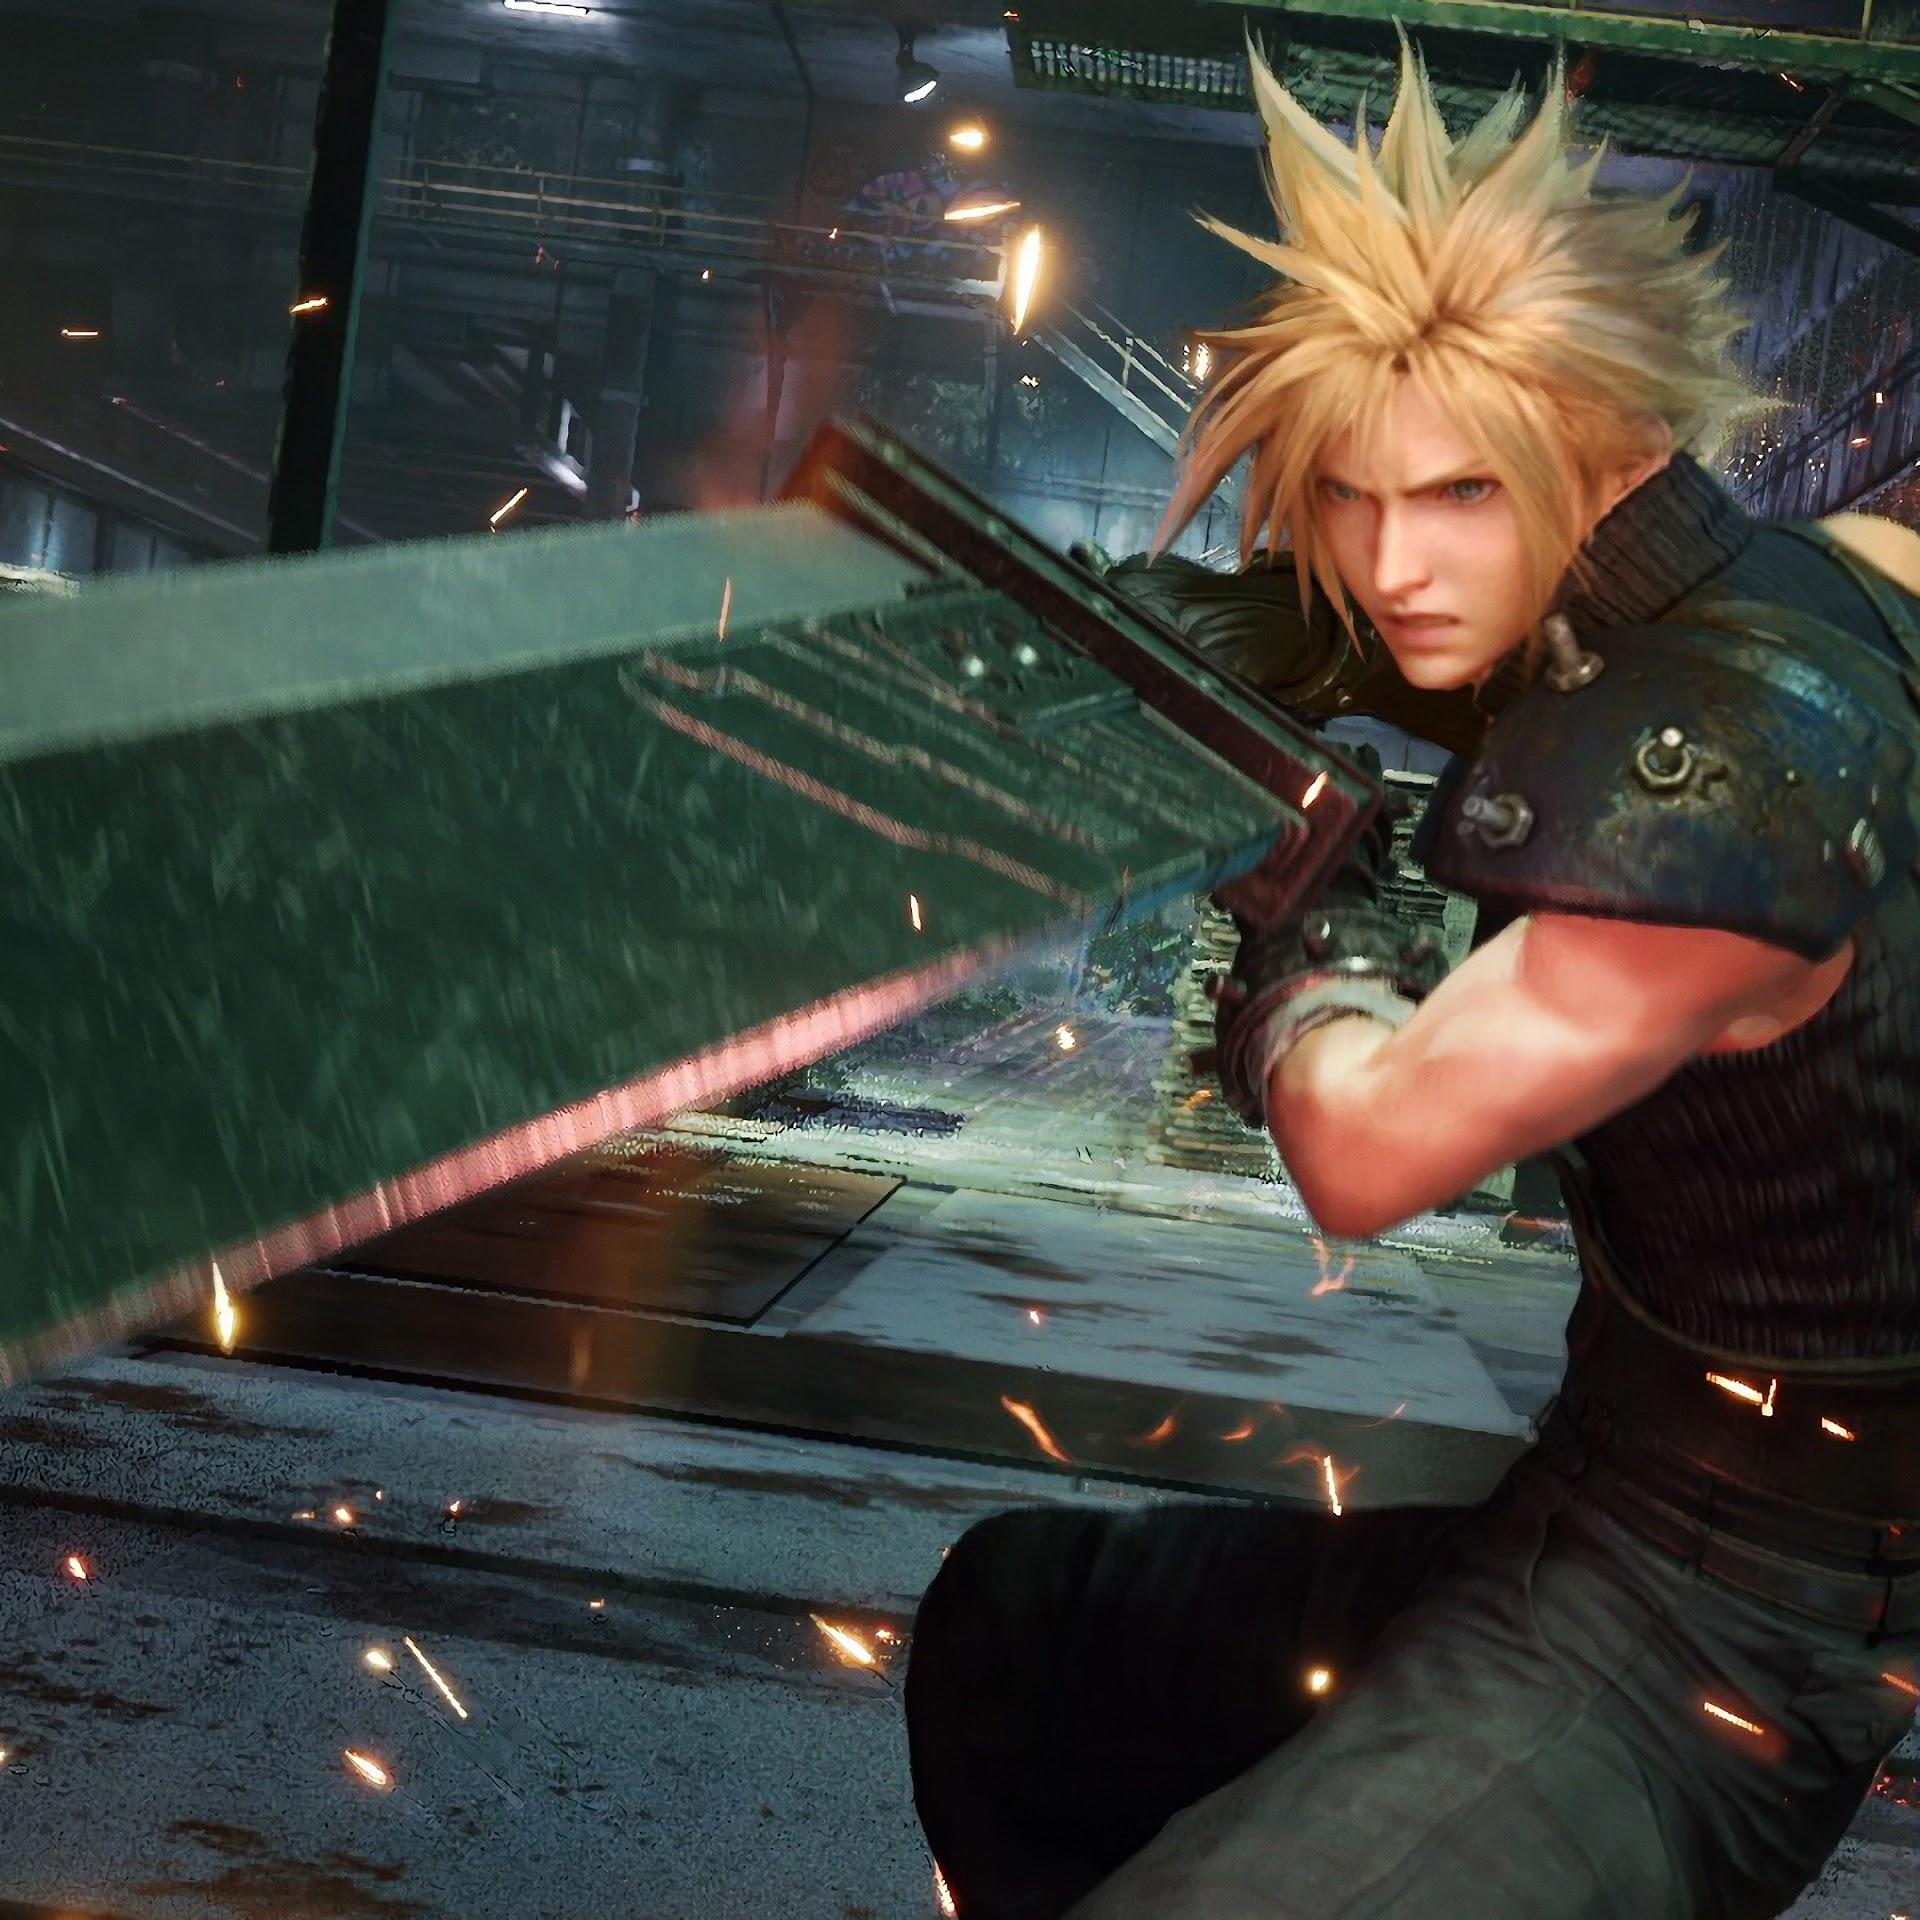 Cloud Strife, Sword, Final Fantasy 7 Remake, 4K, #31 Wallpaper